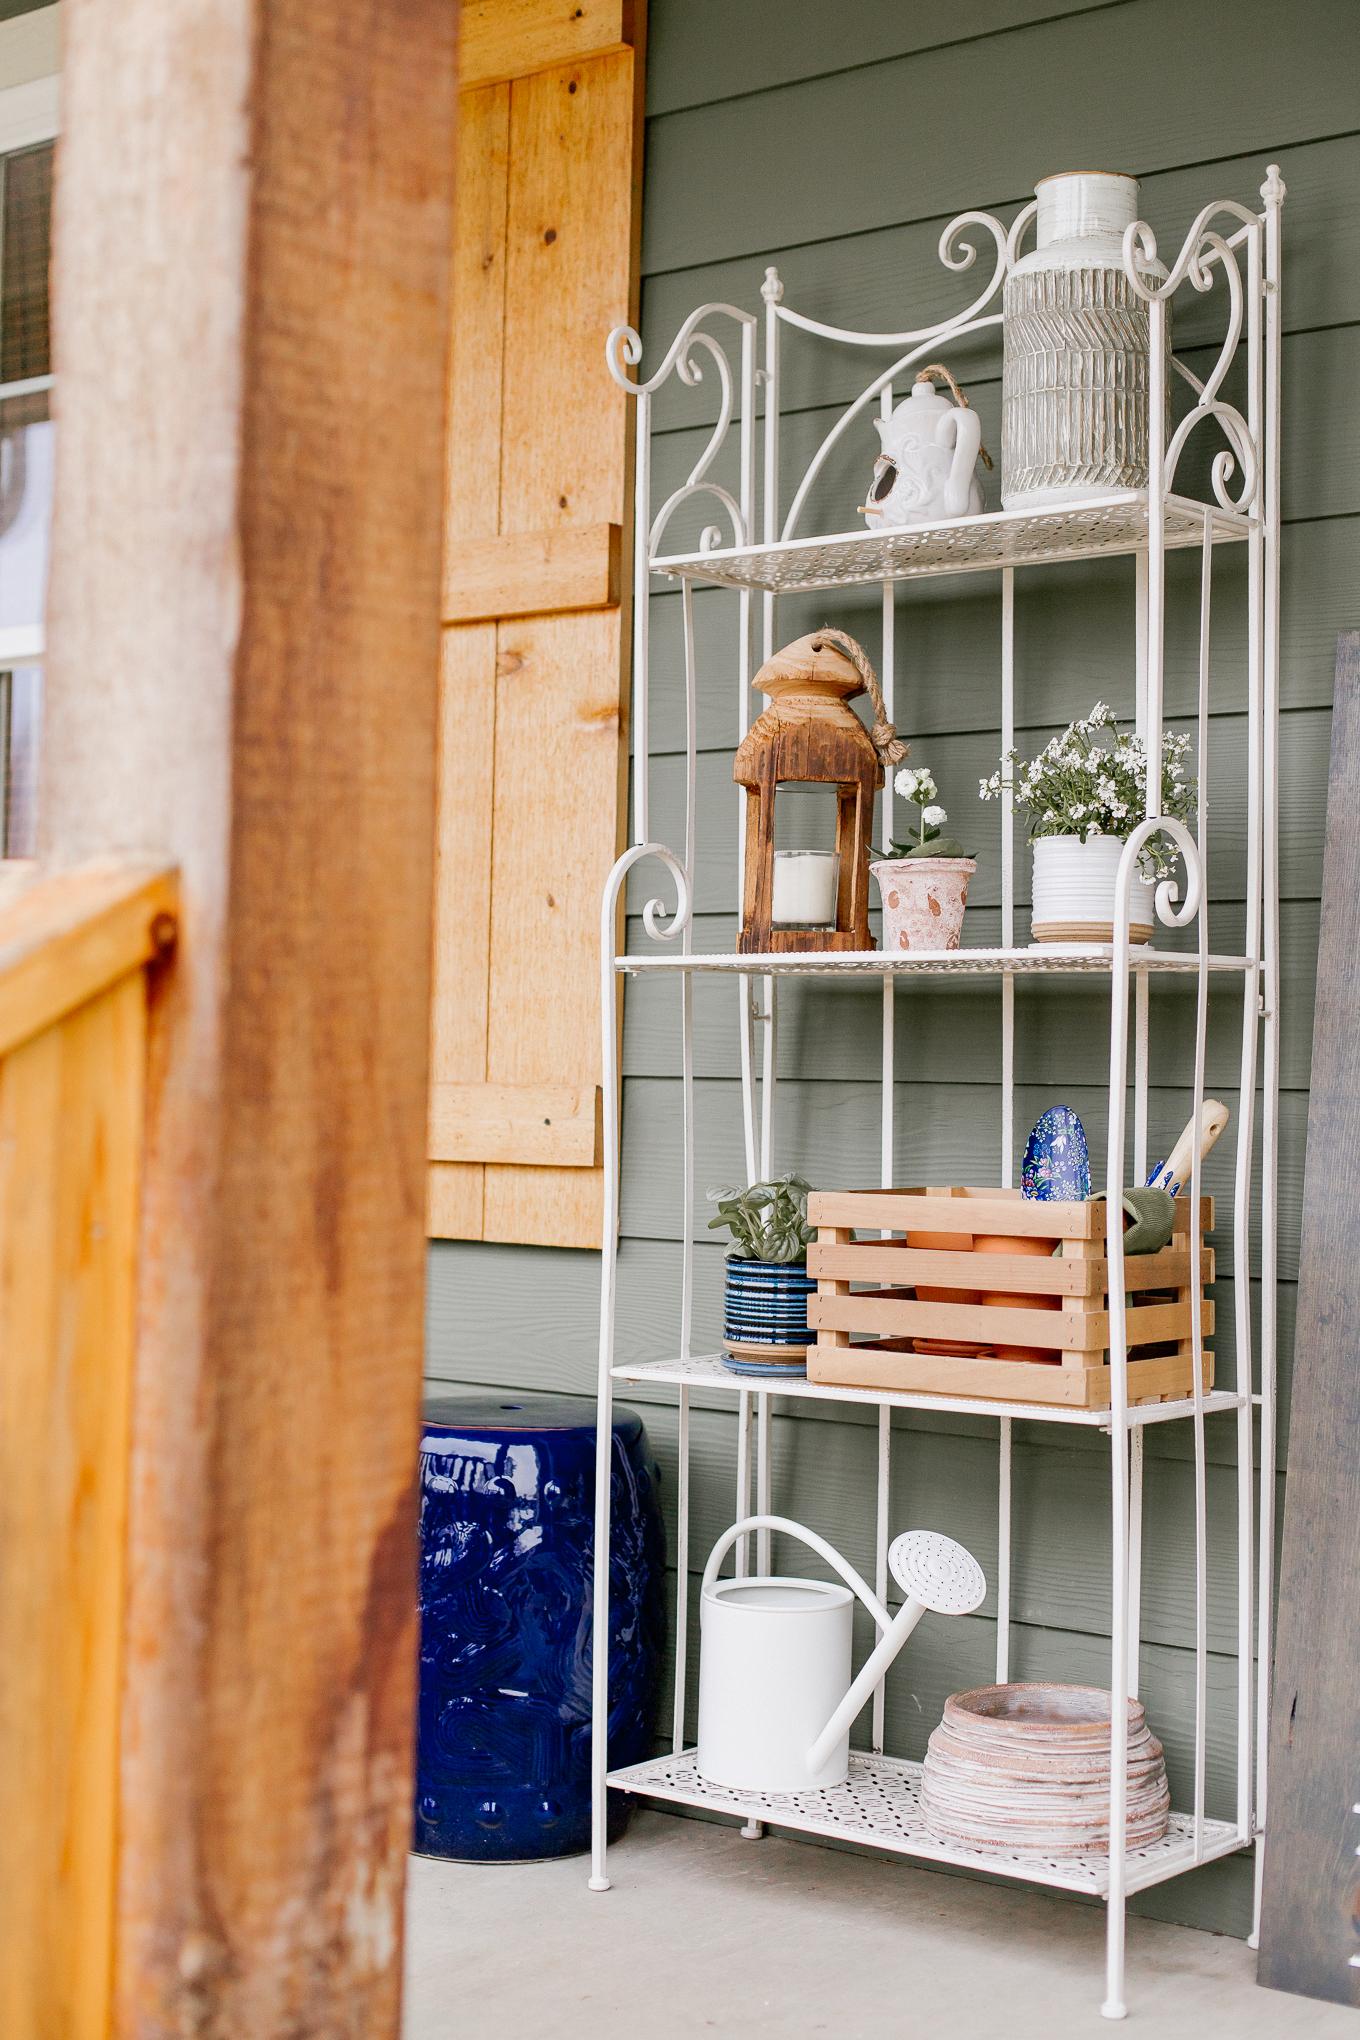 Potting Shelf, Outdoor Shelf, Garden Shelf | Outdoor Space Decor | Louella Reese